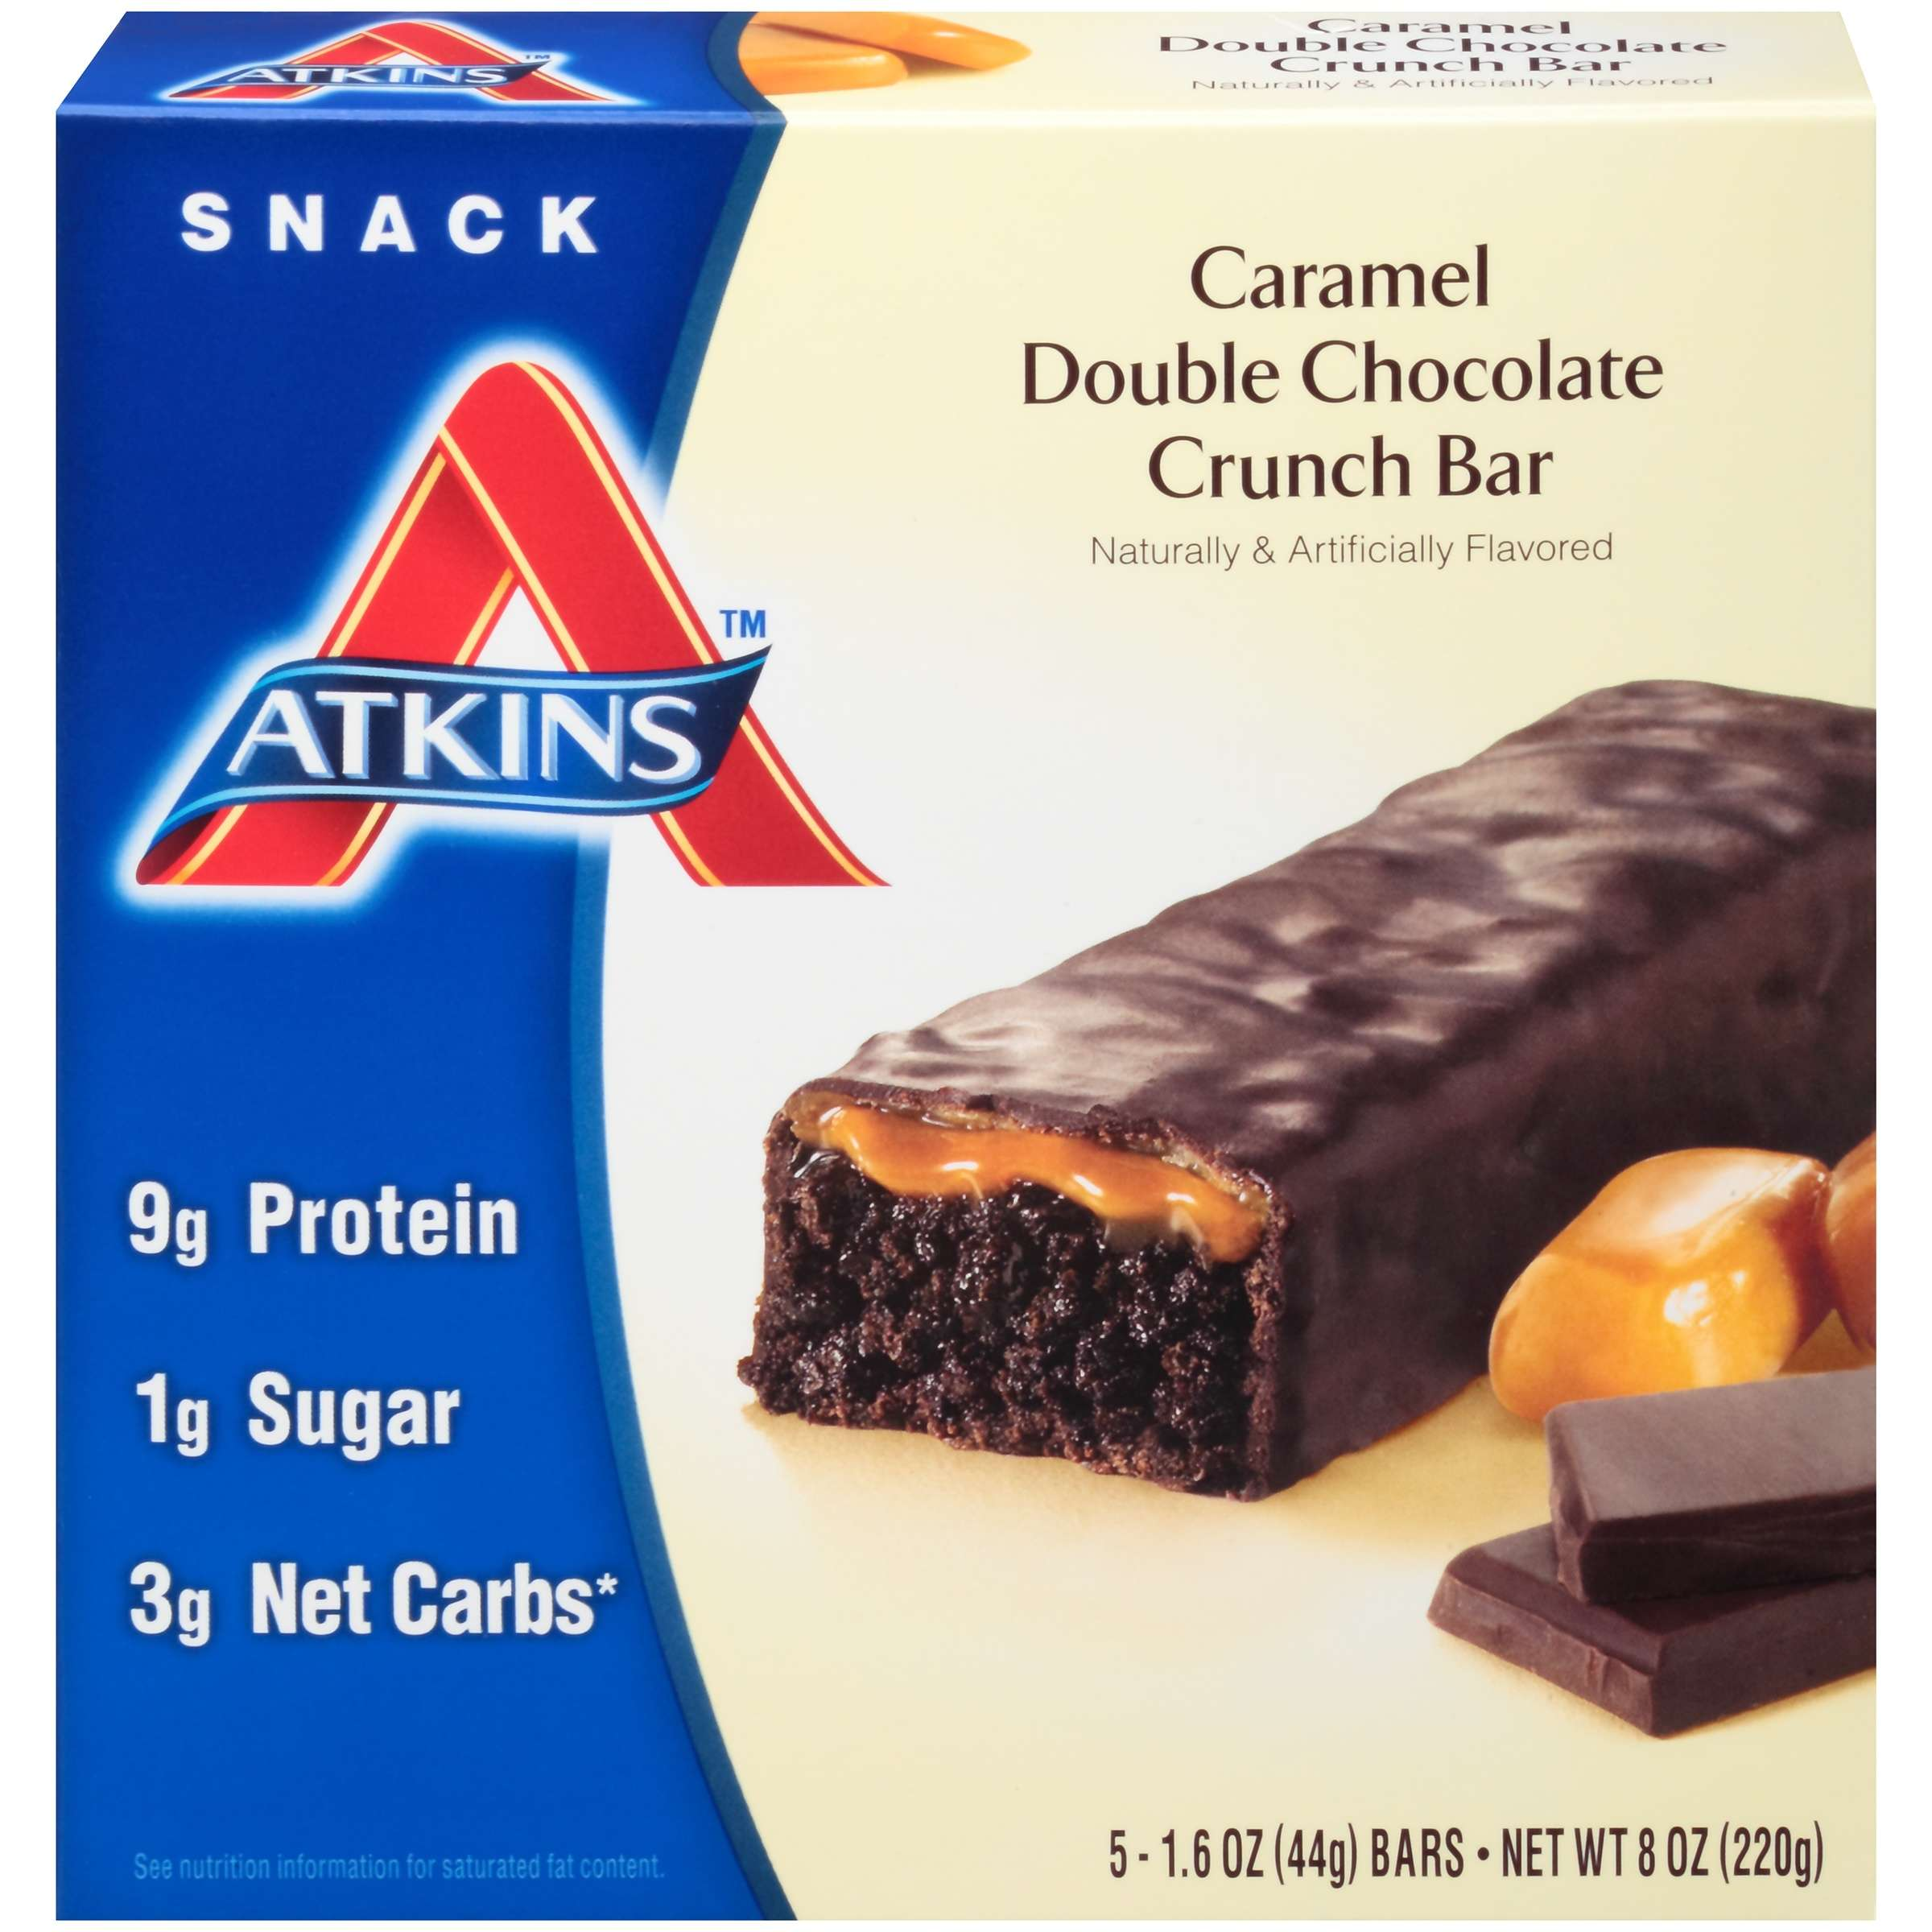 Atkins Caramel Double Chocolate Crunch Bar,1.6oz, 5-pack (Snack)